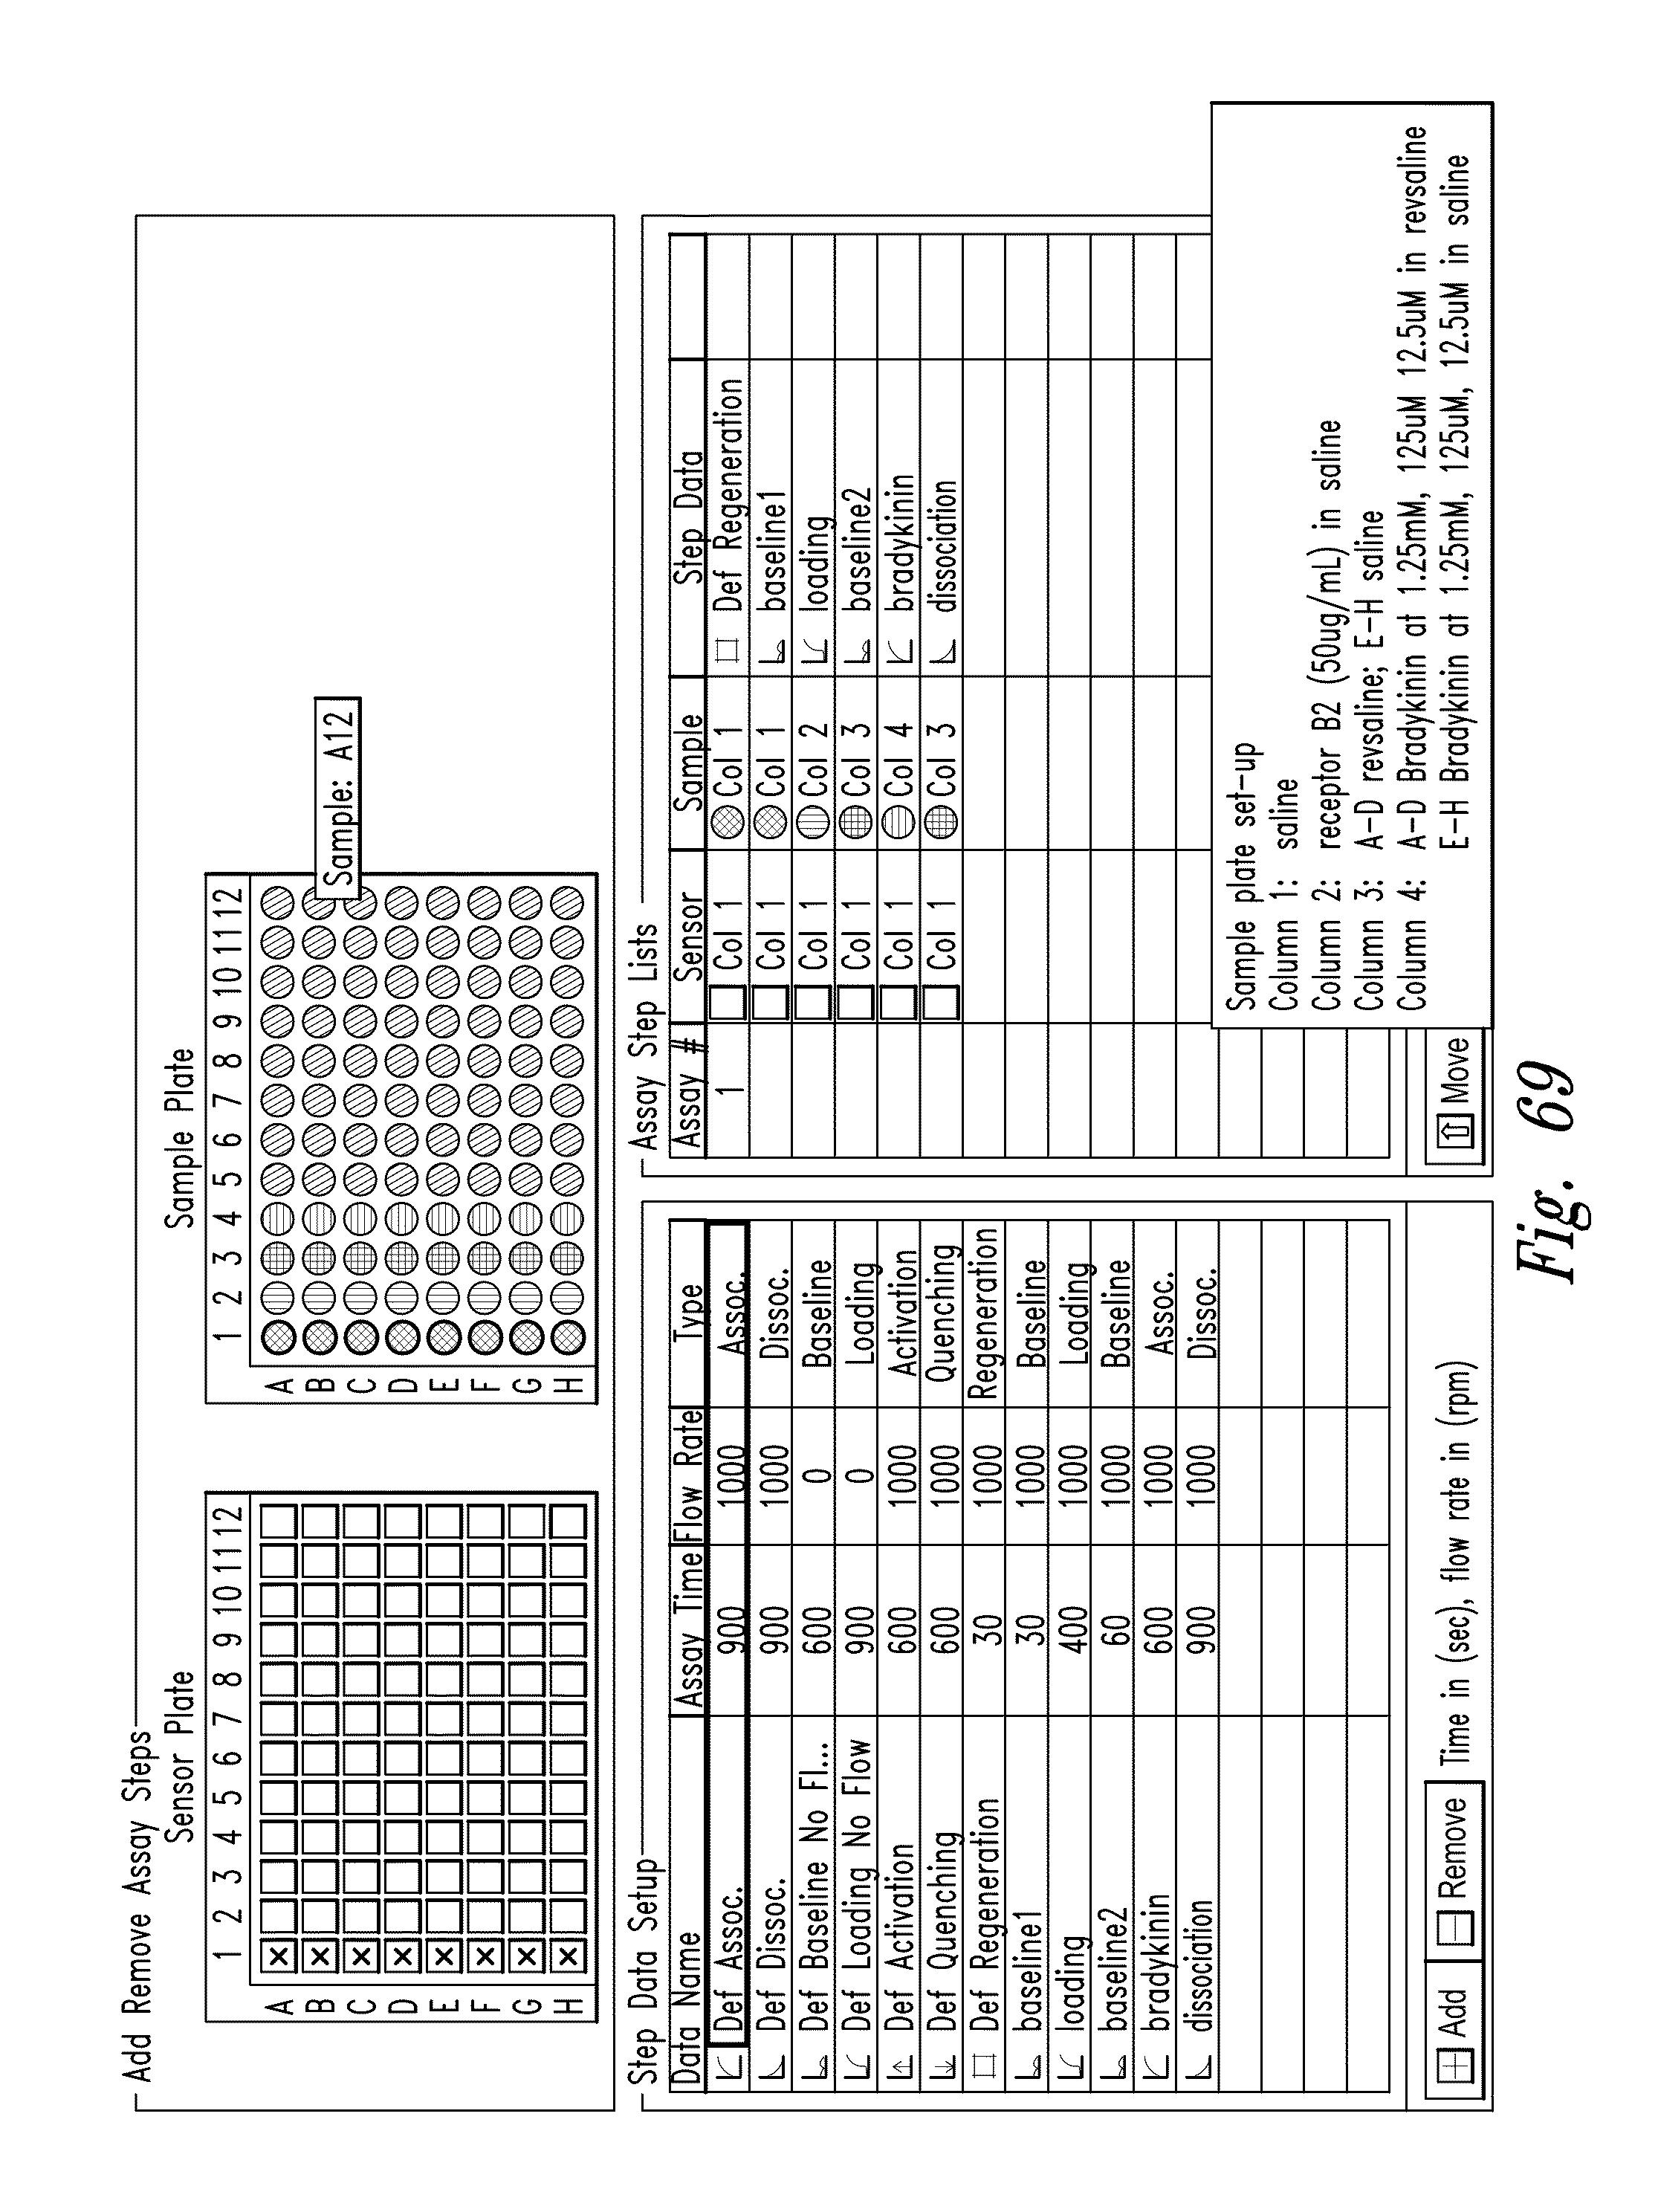 Patent US 10,125,359 B2 on